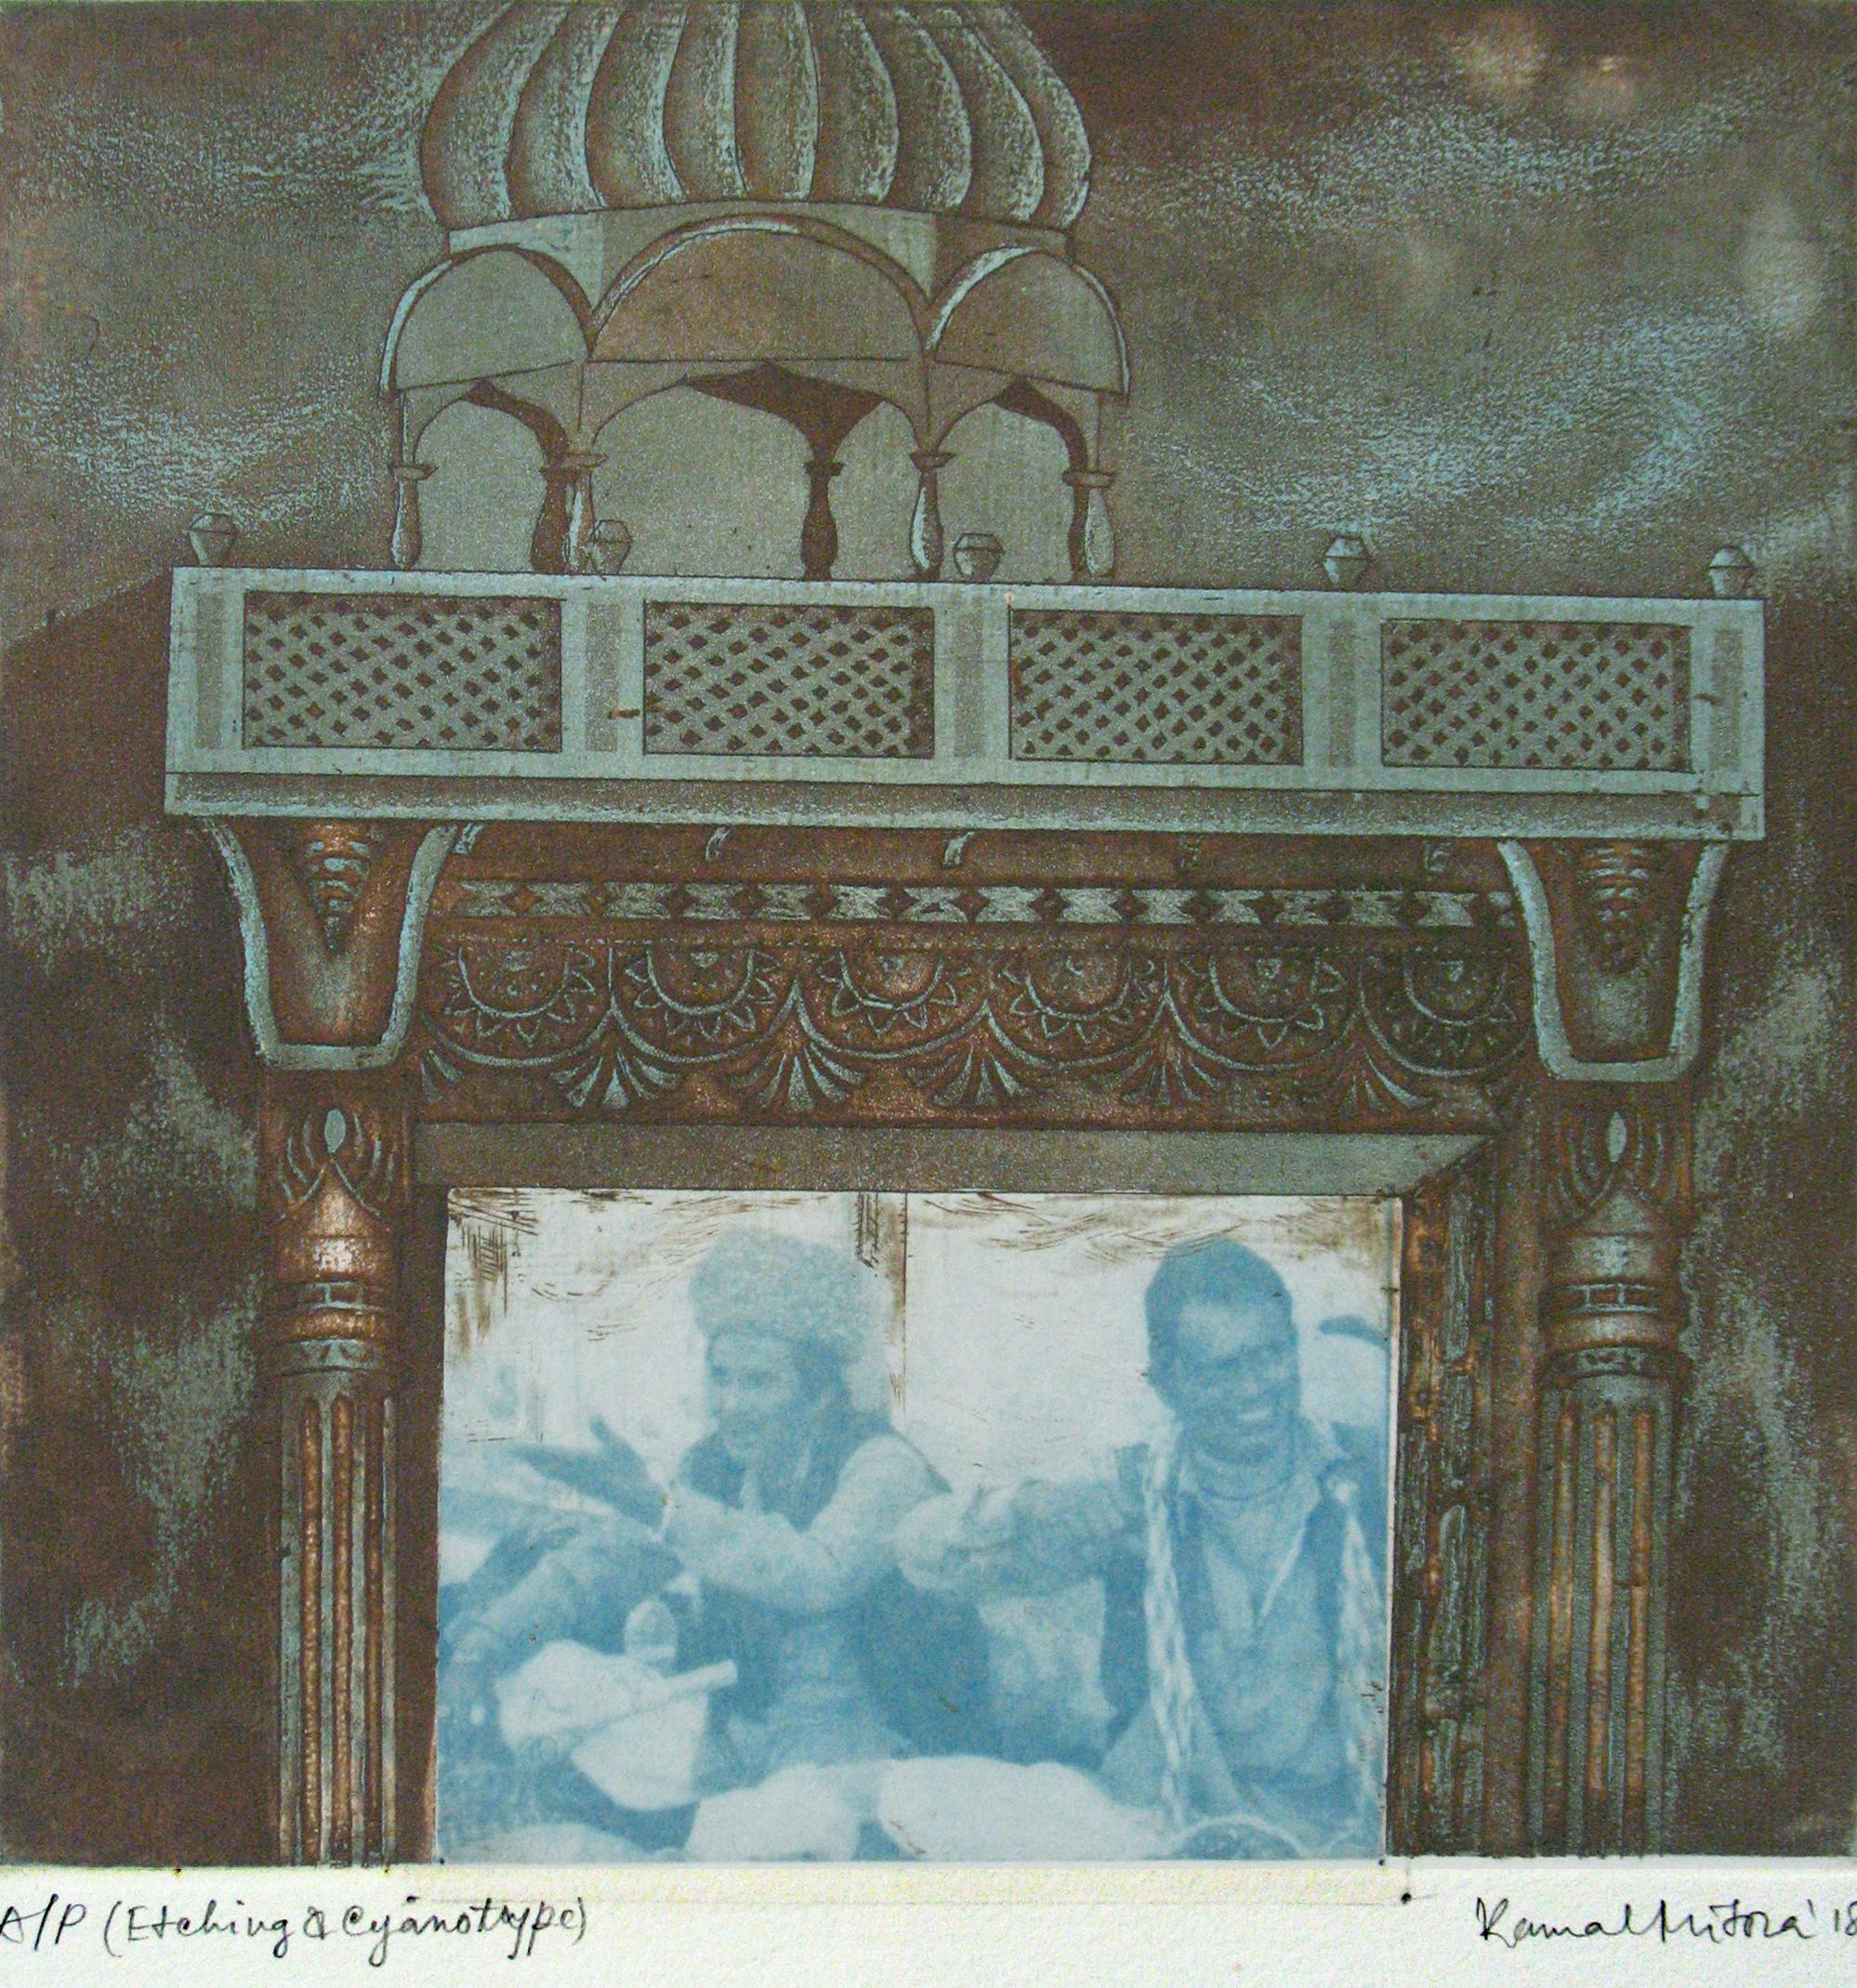 "Folk Singer, Etching, Cyanotype on paper, Blue, Green by Indian Artist""In Stock"""